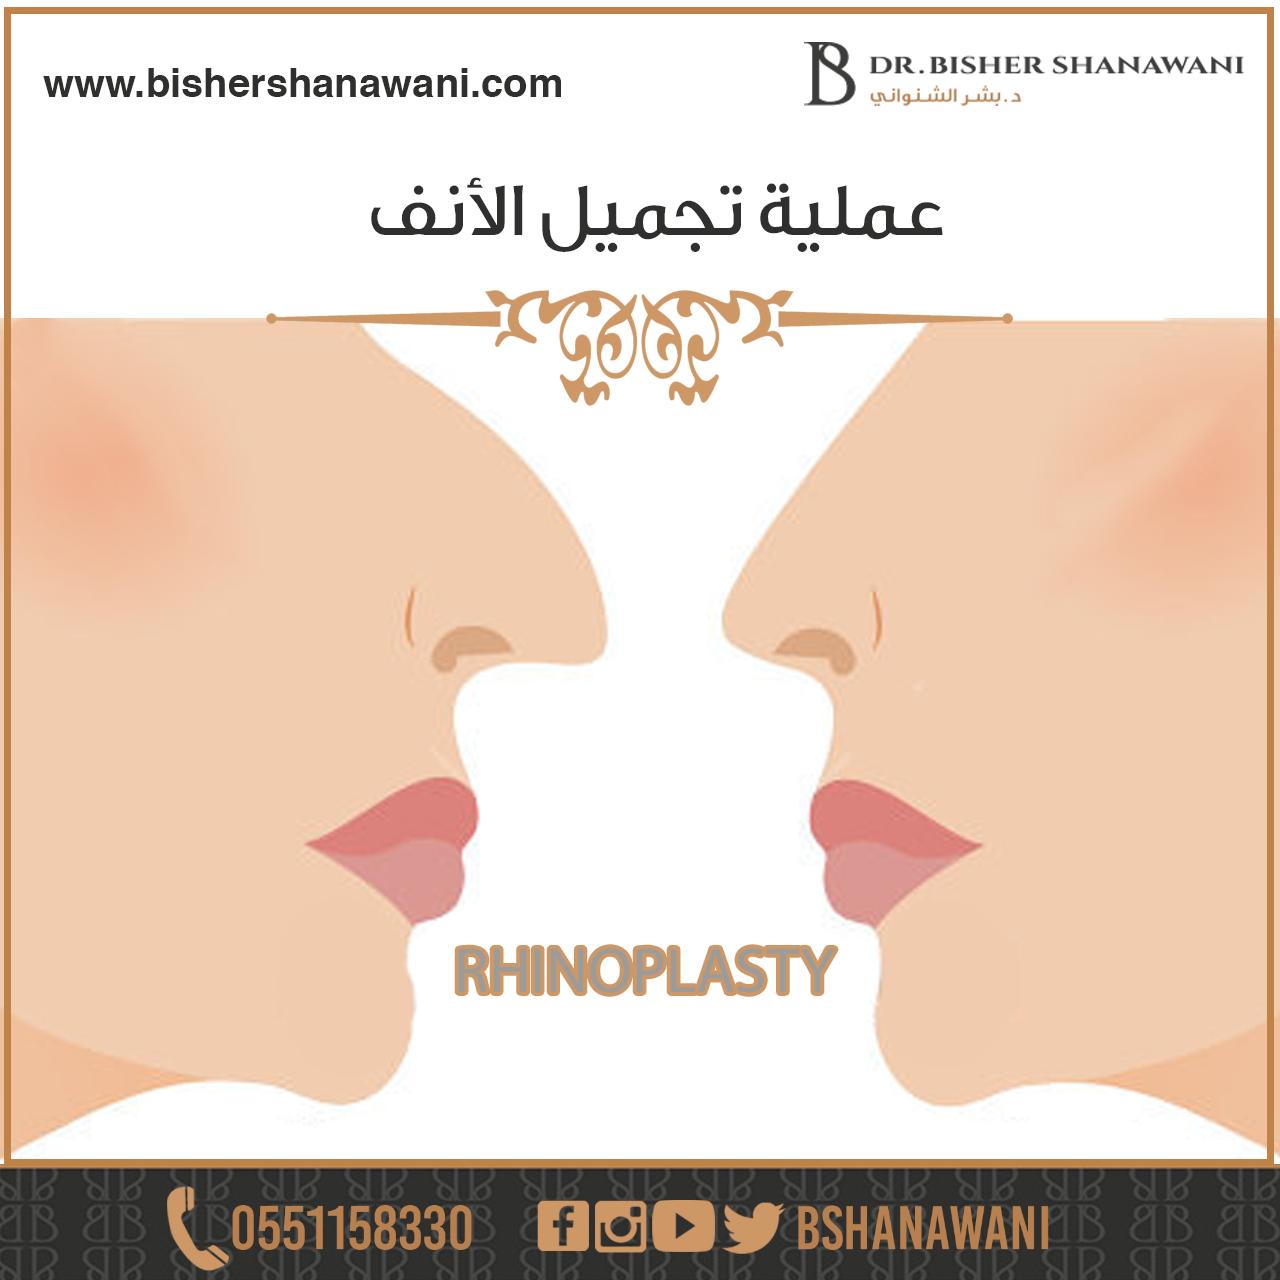 Nose Reshaping Rhinoplasty Istanbul Turkey Nose Reshaping Rhinoplasty Plastic Surgery